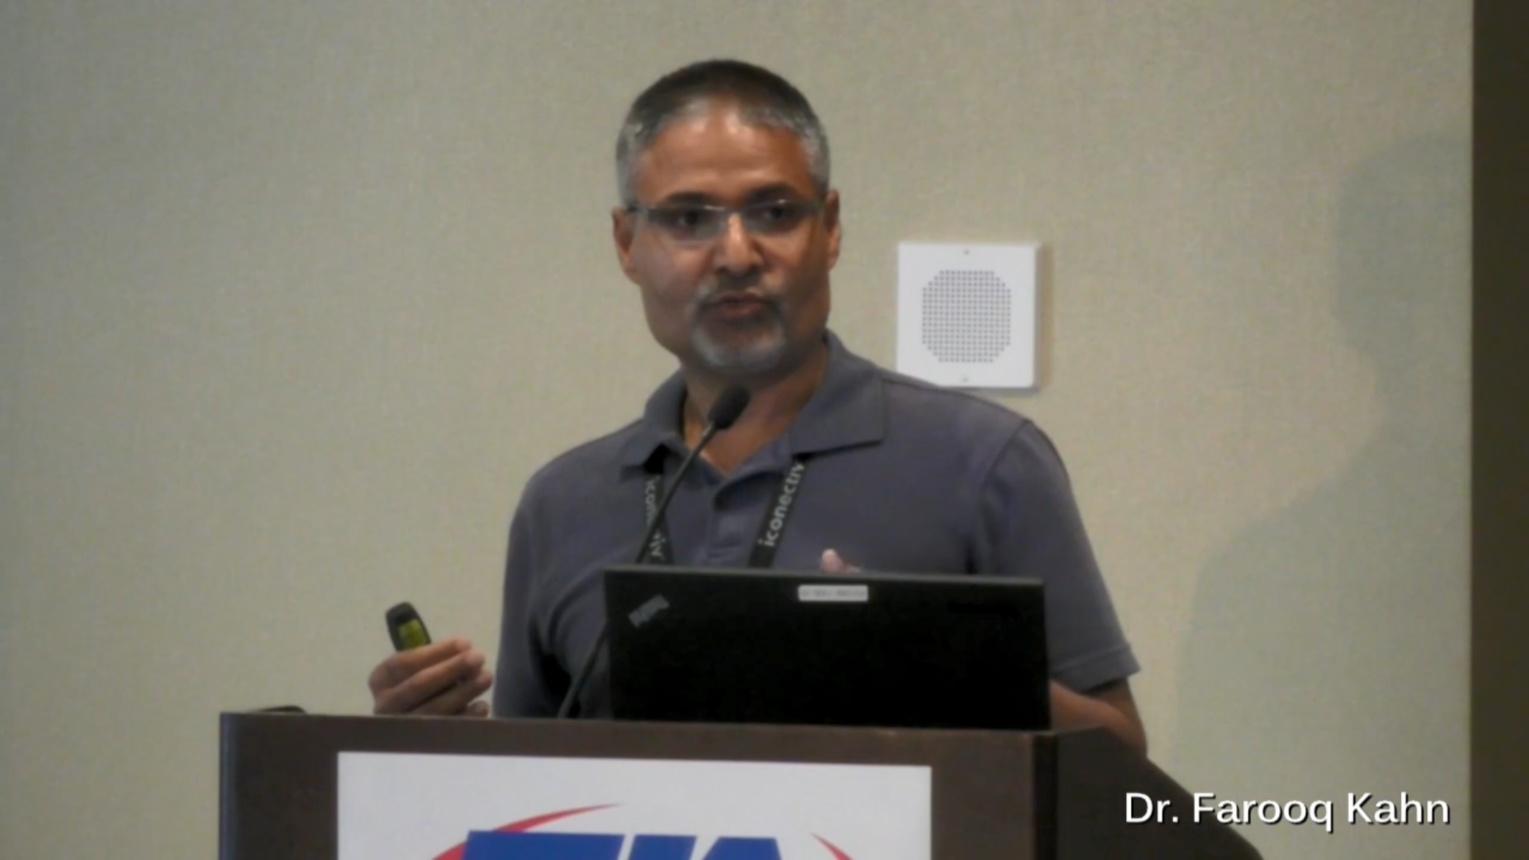 Keynote: Rolling out 5G in 2017 - Dr. Farooq Khan, PHAZR